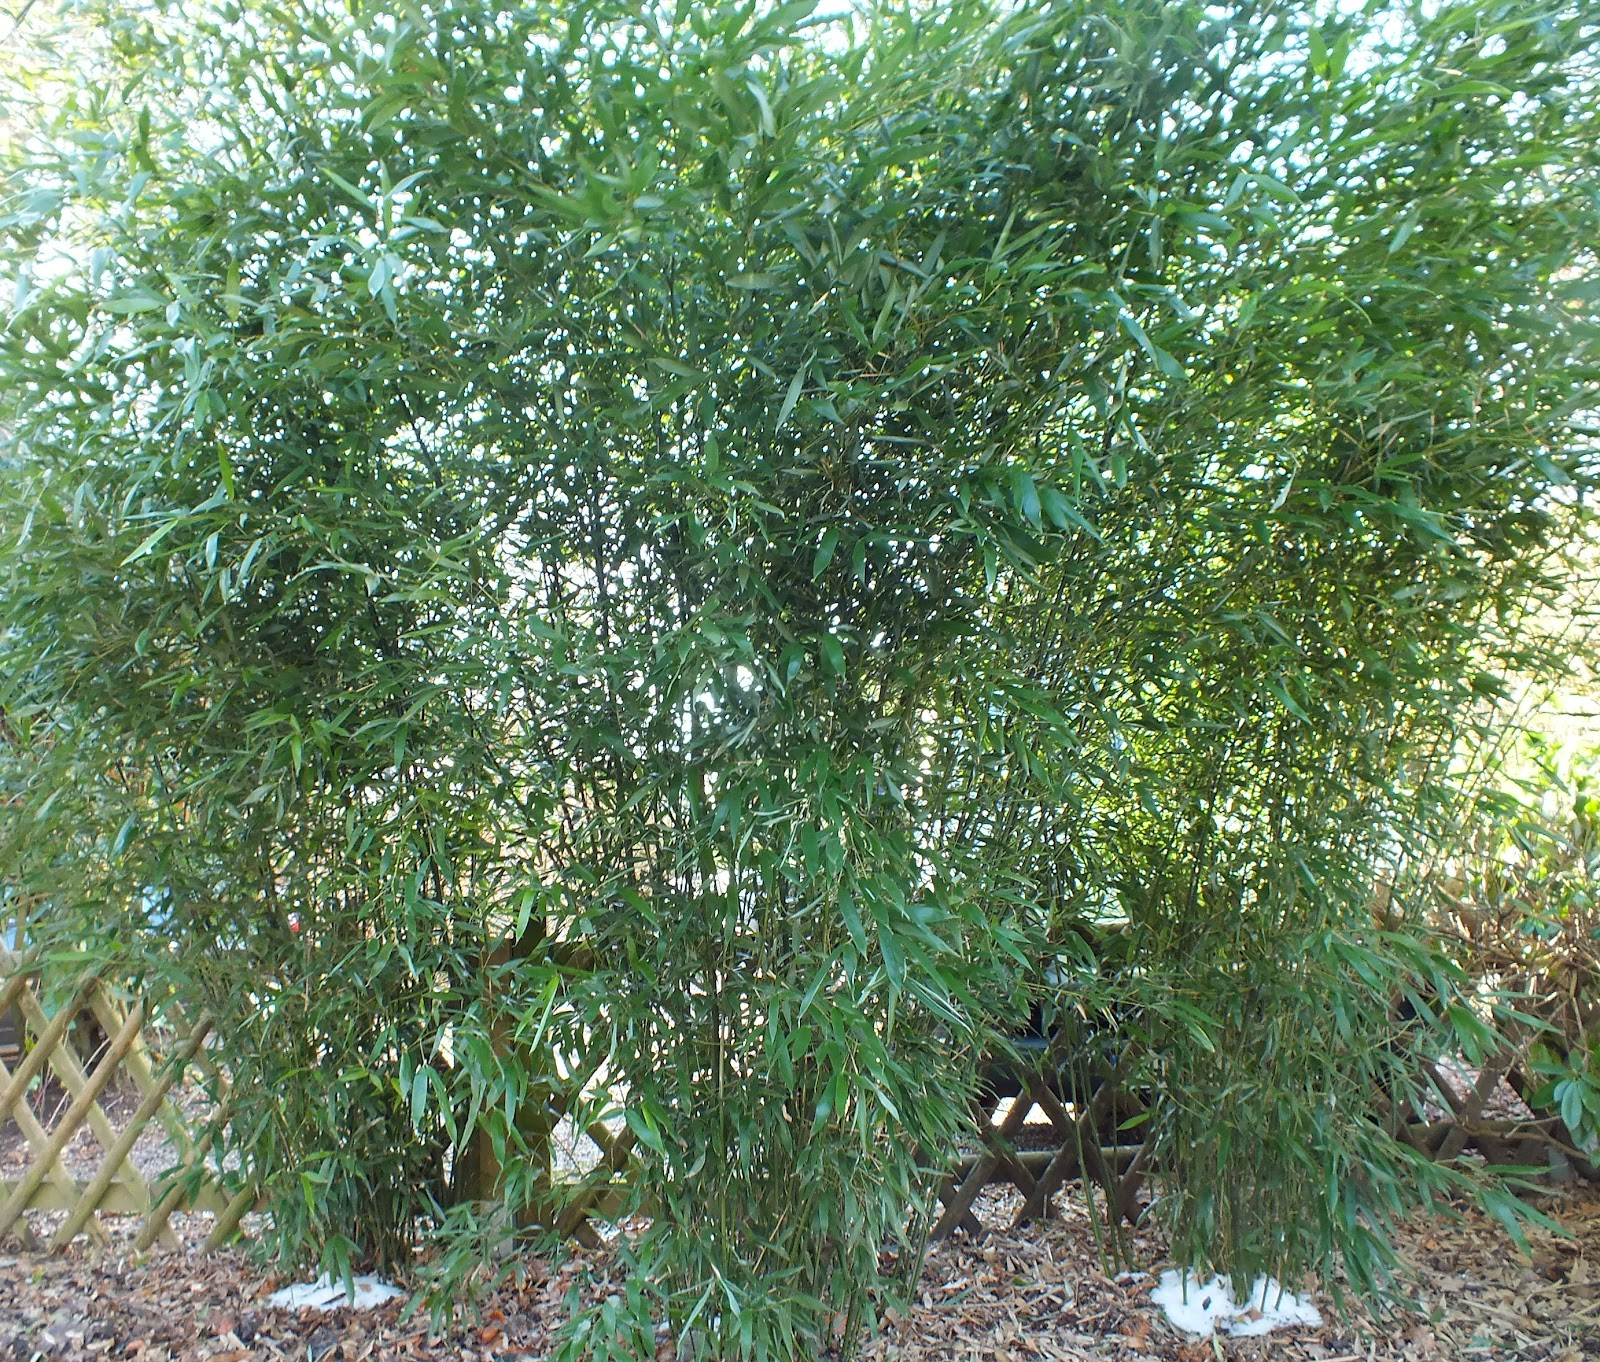 bambus kamelien yuccas bambus nach dem frost 2012 die gewinner. Black Bedroom Furniture Sets. Home Design Ideas